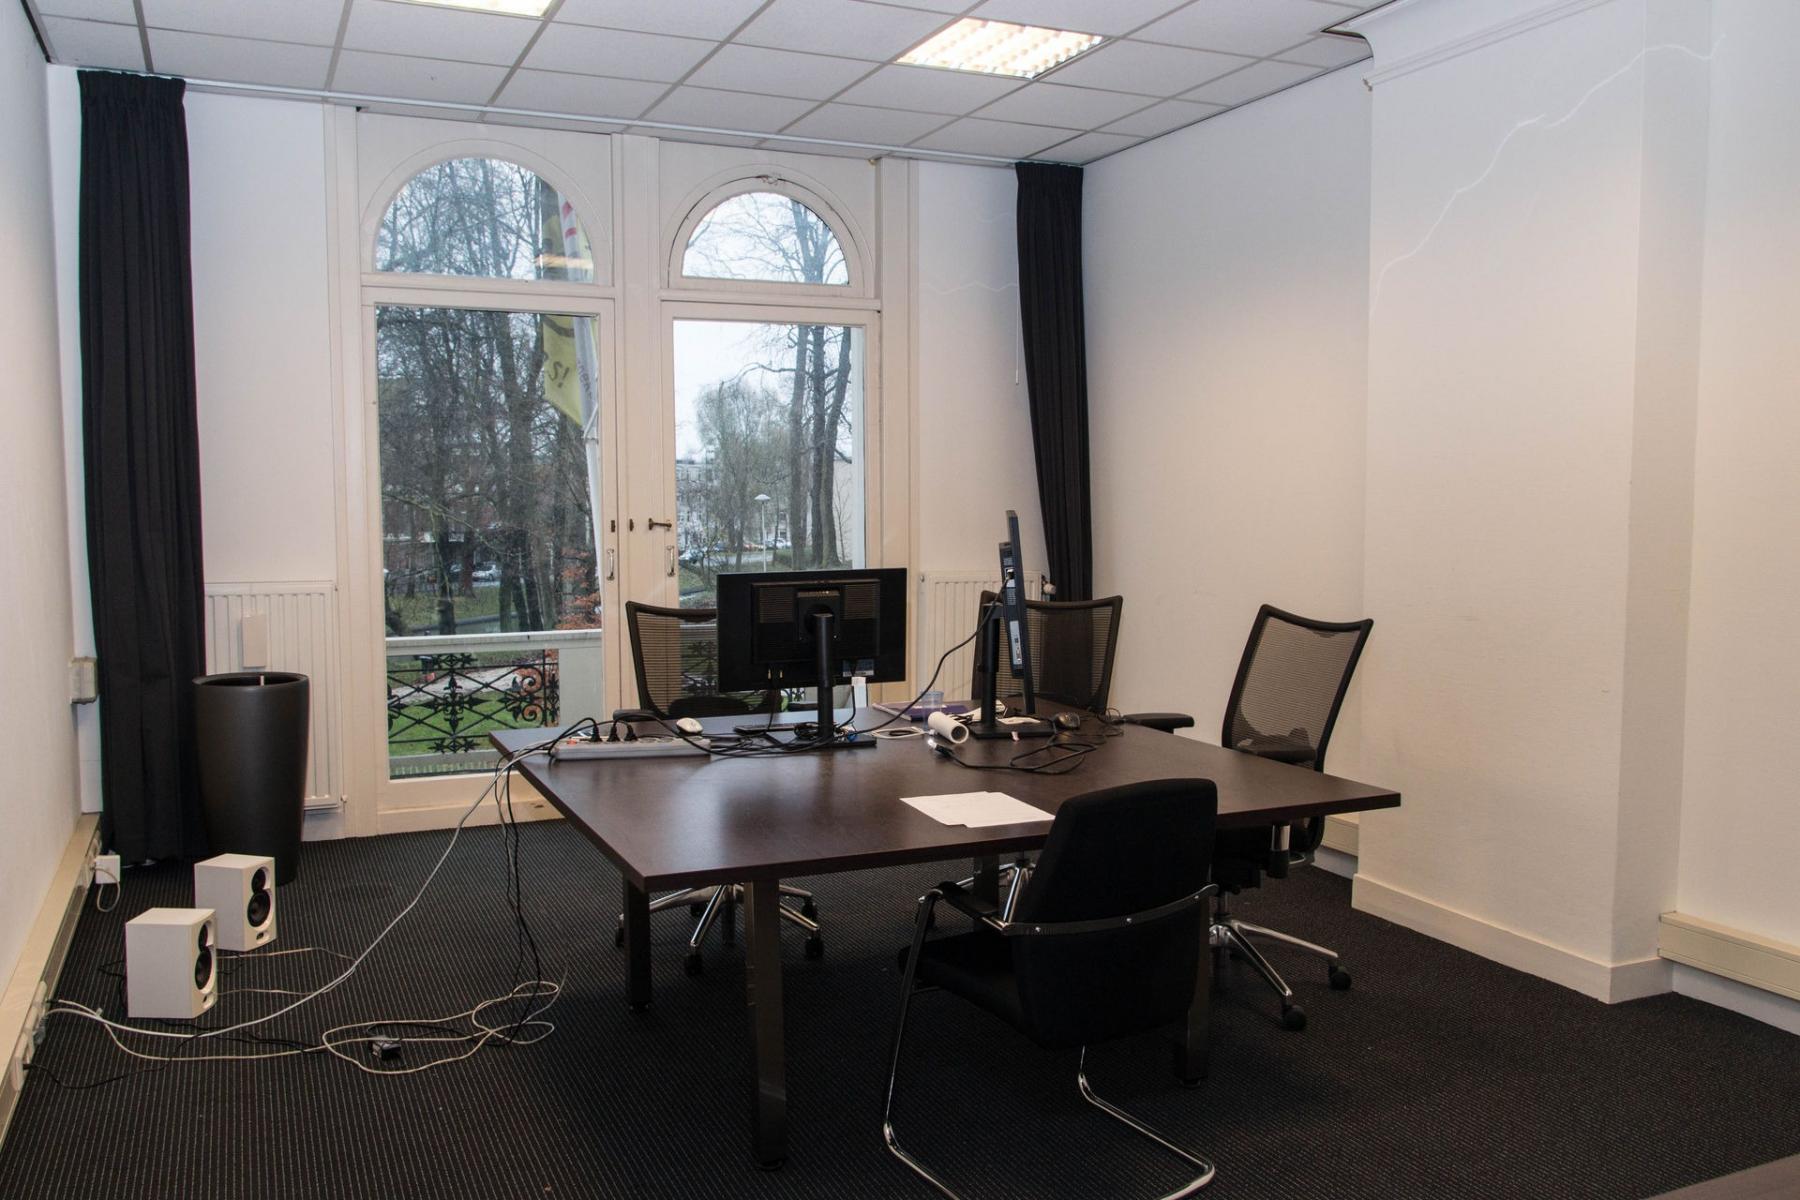 Element Offices - Lucasbolwerk Utrecht